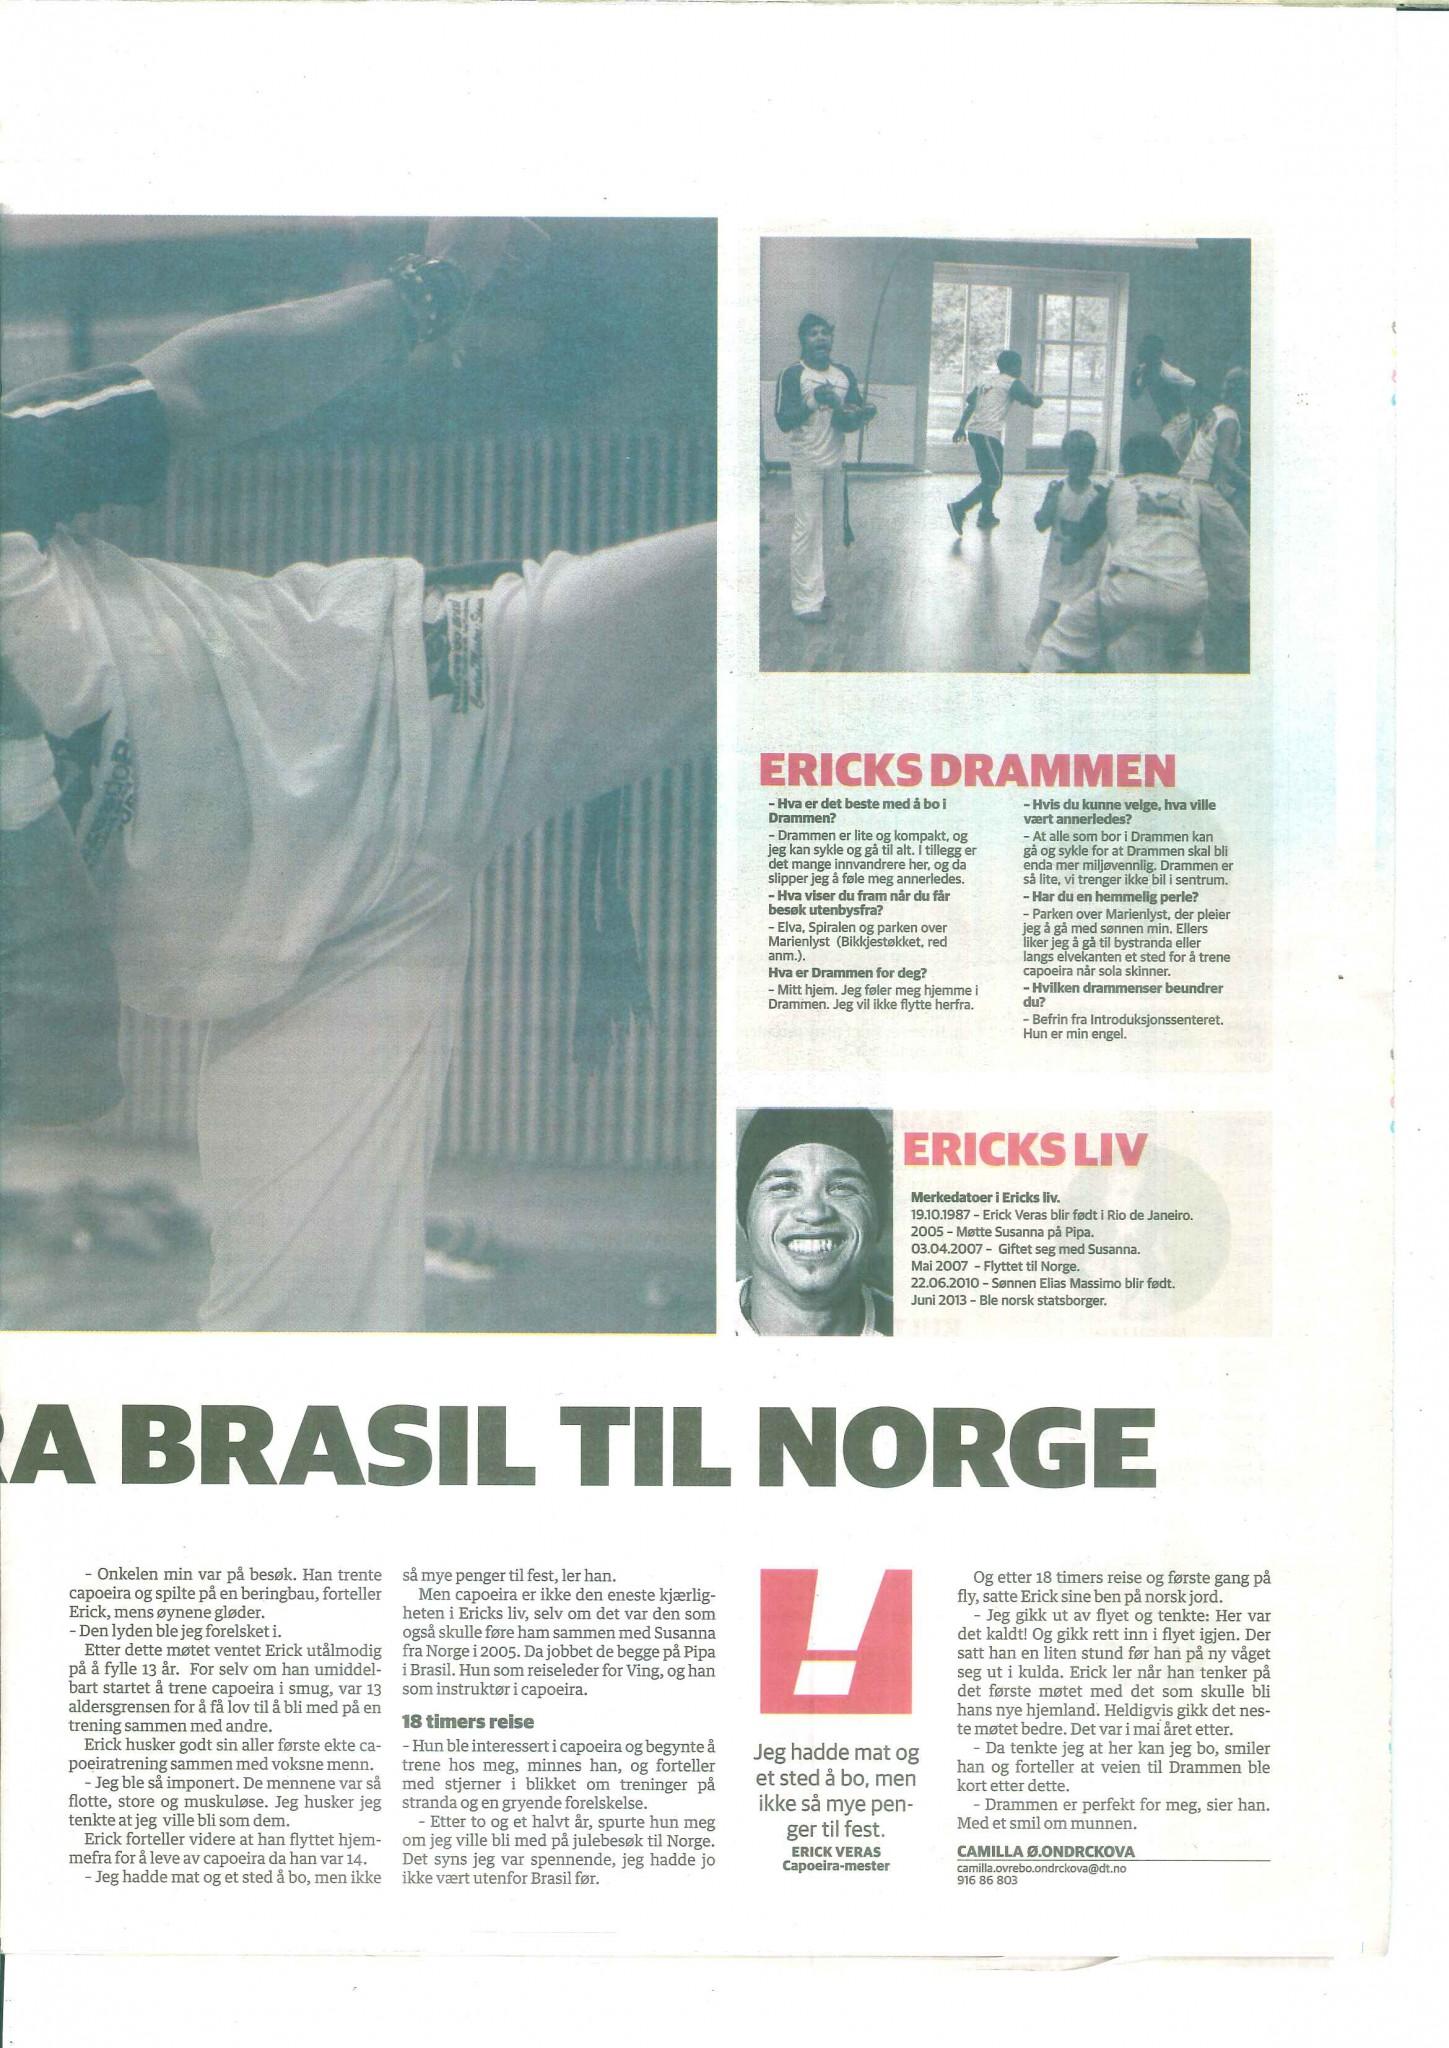 drammens-tidene-capoeira-erick-veras2